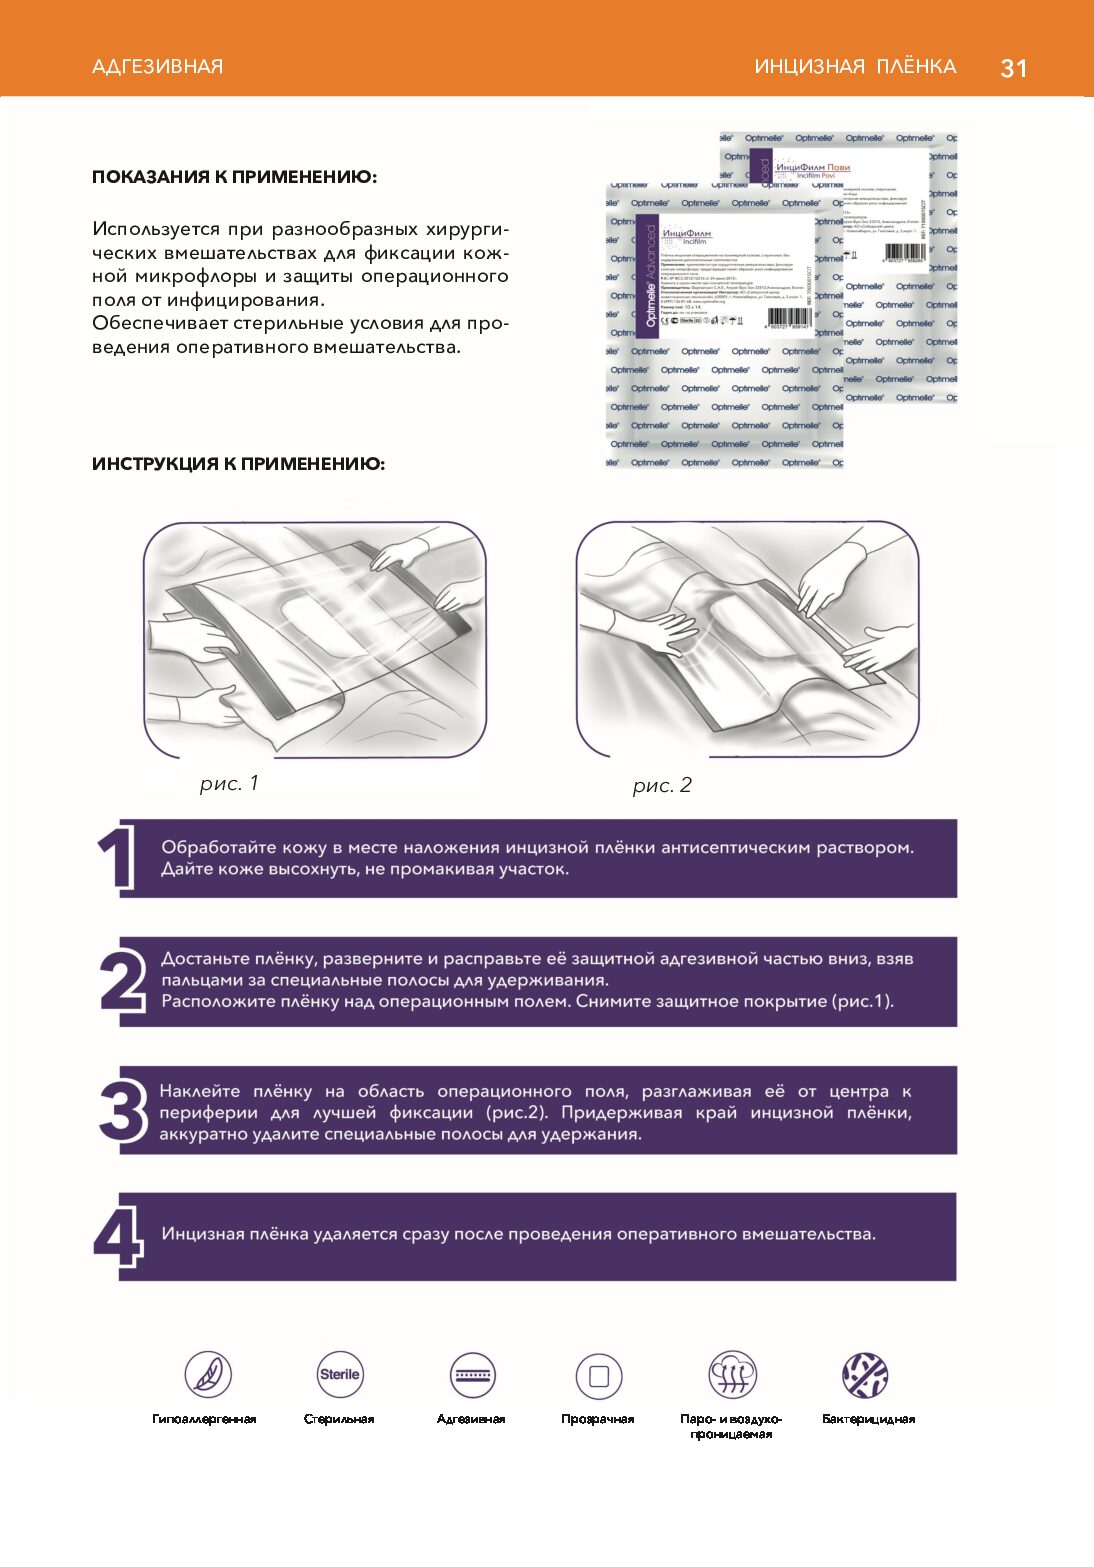 продукции Optimelle 31 pdf